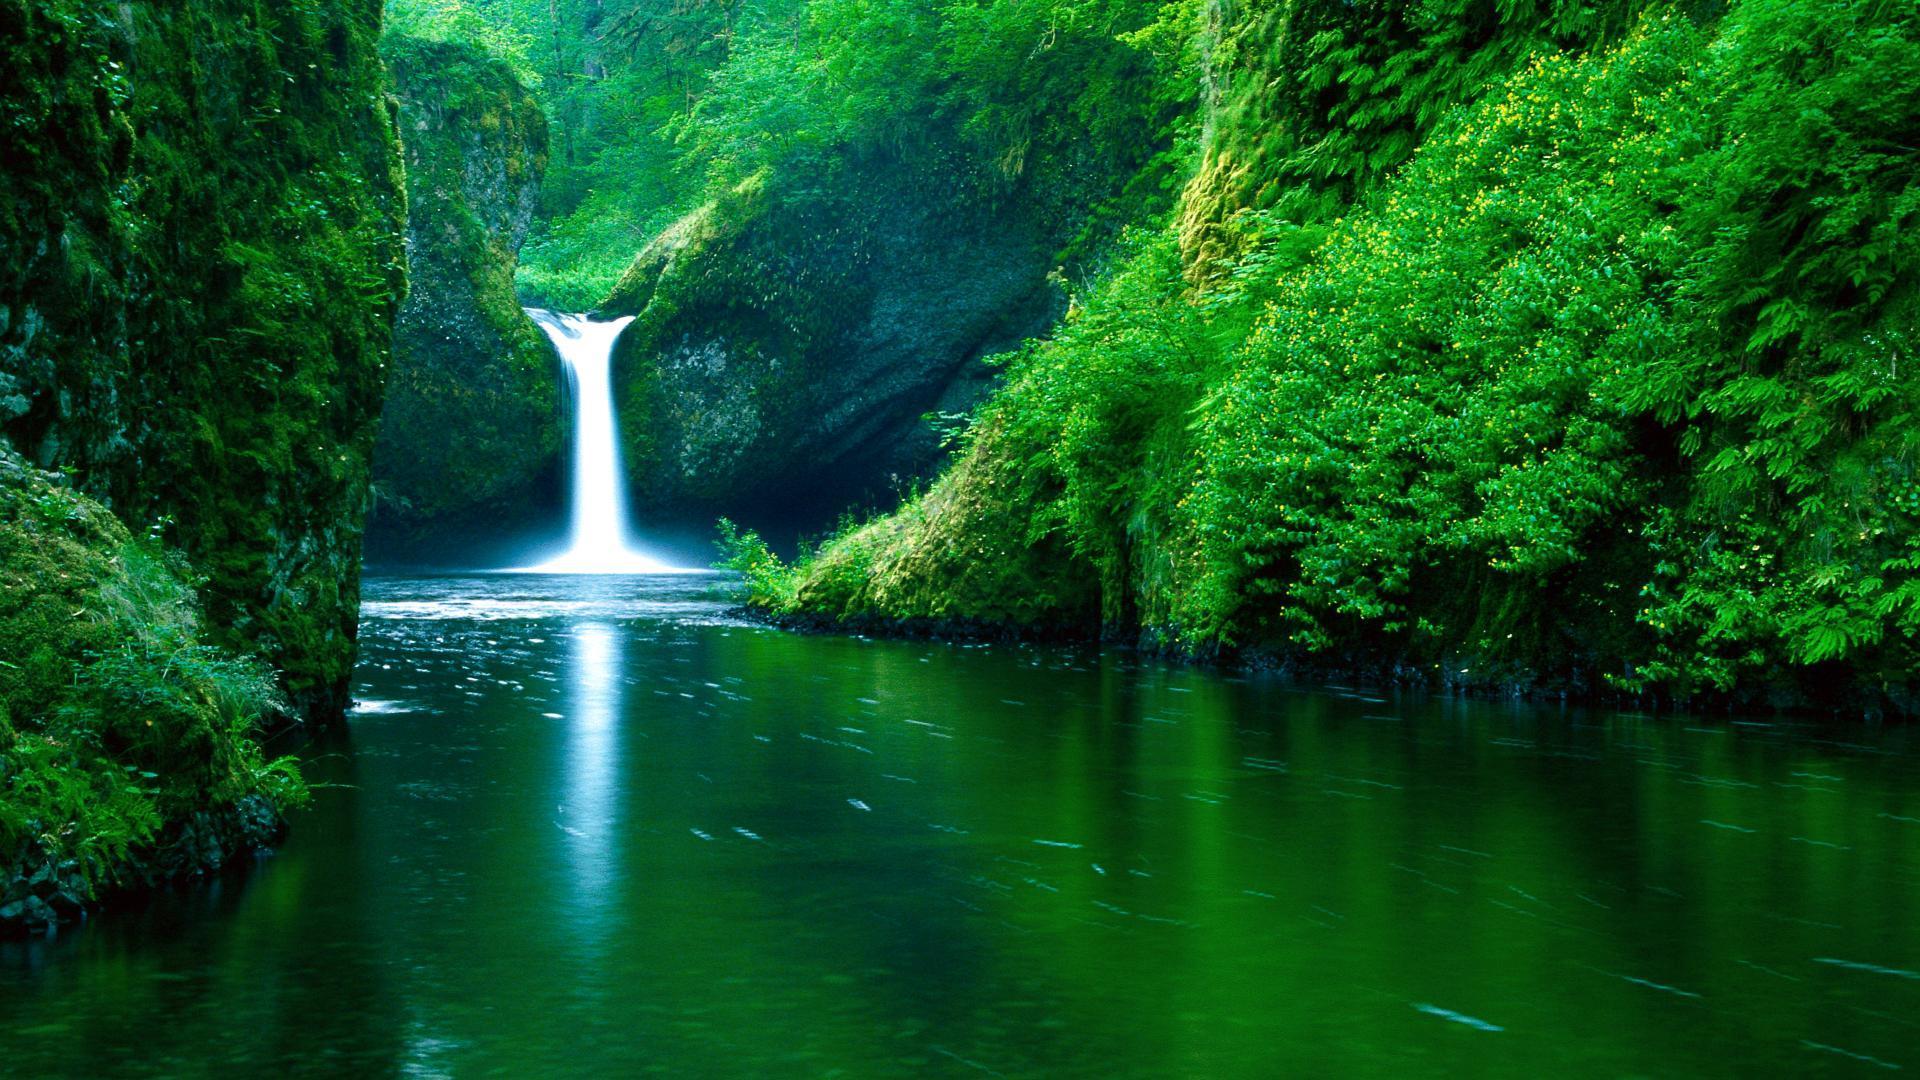 Hd Wallpapers For Desktop Nature Widescreen